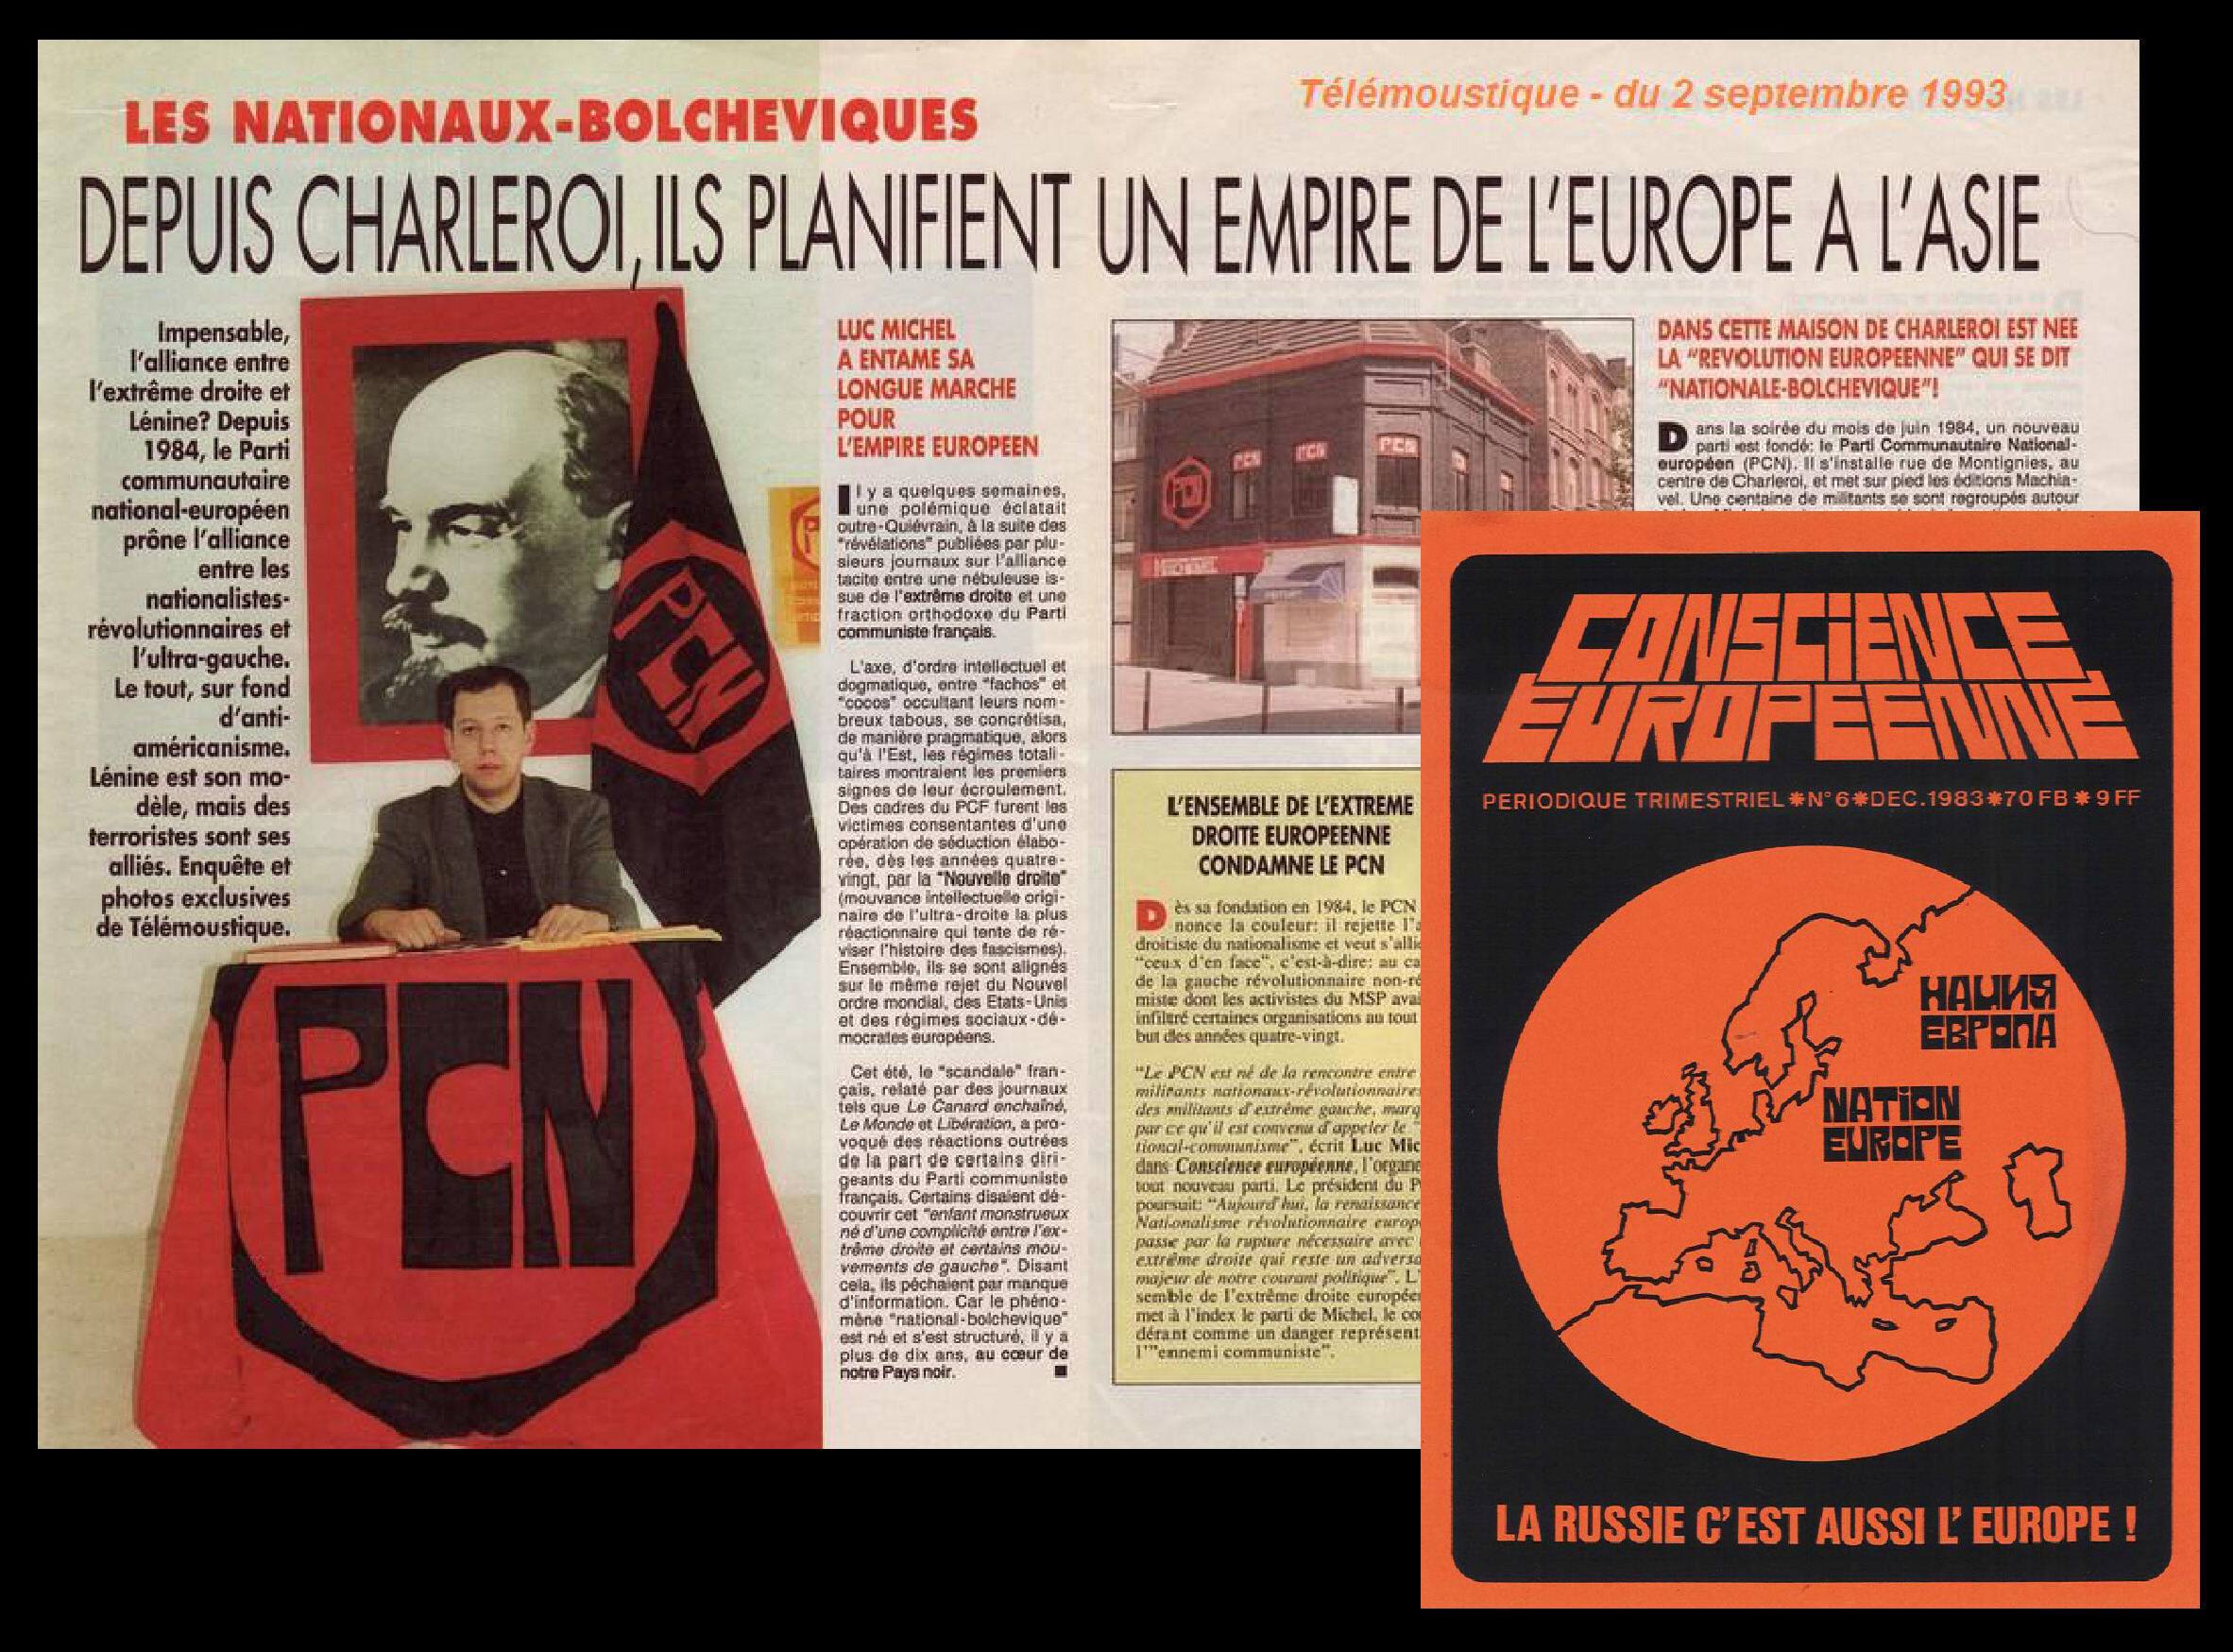 LM.GEOPOL - Genèse neoeurasisme II euro-soviet (2018 04 03) FR (2)